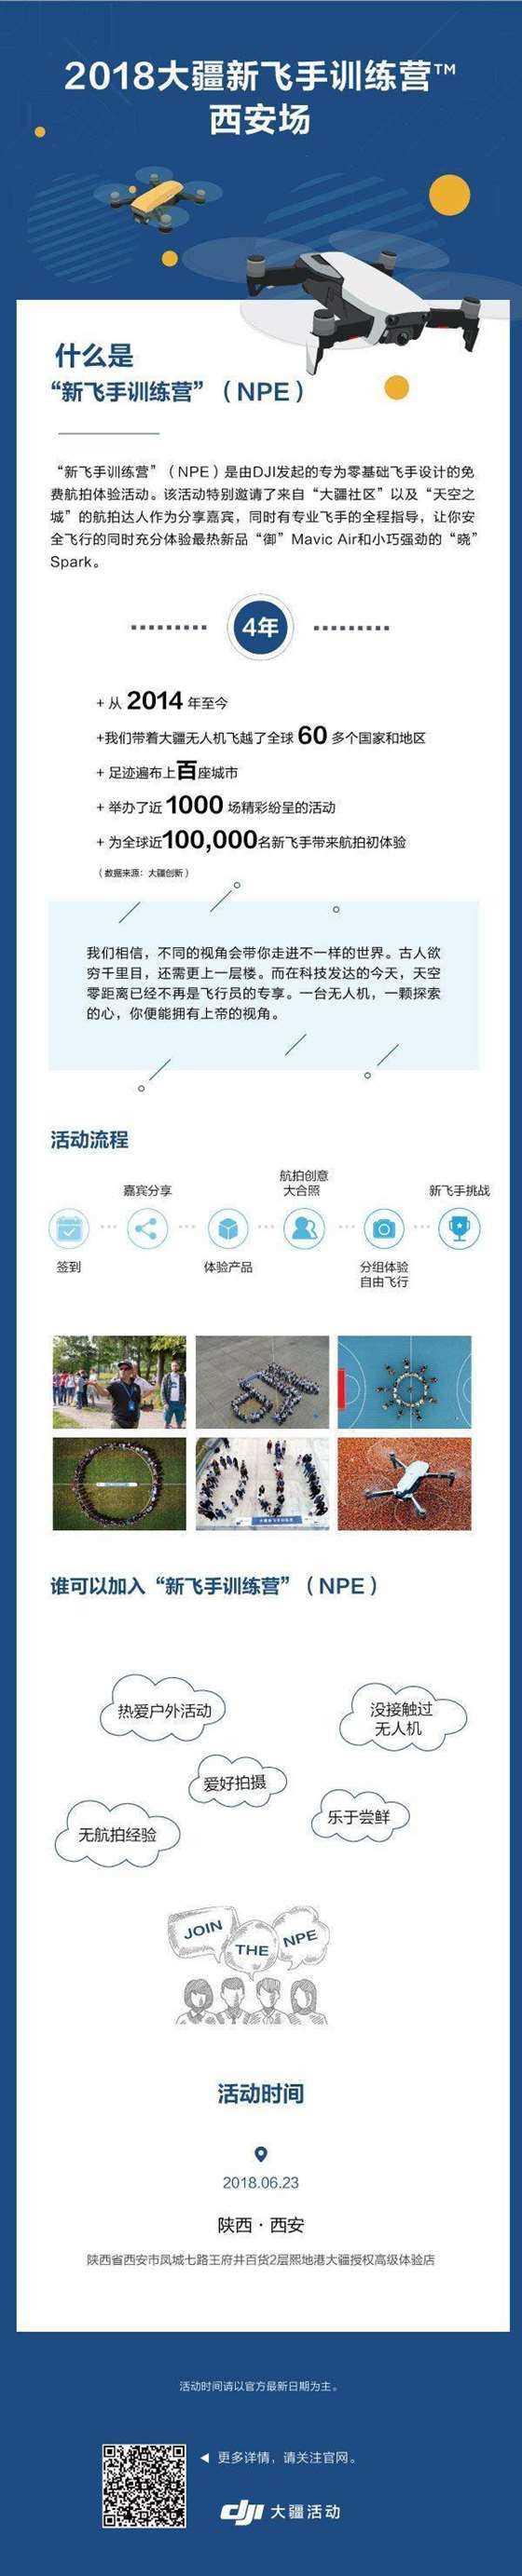 NPE活动宣传页-0523-西安场.jpg